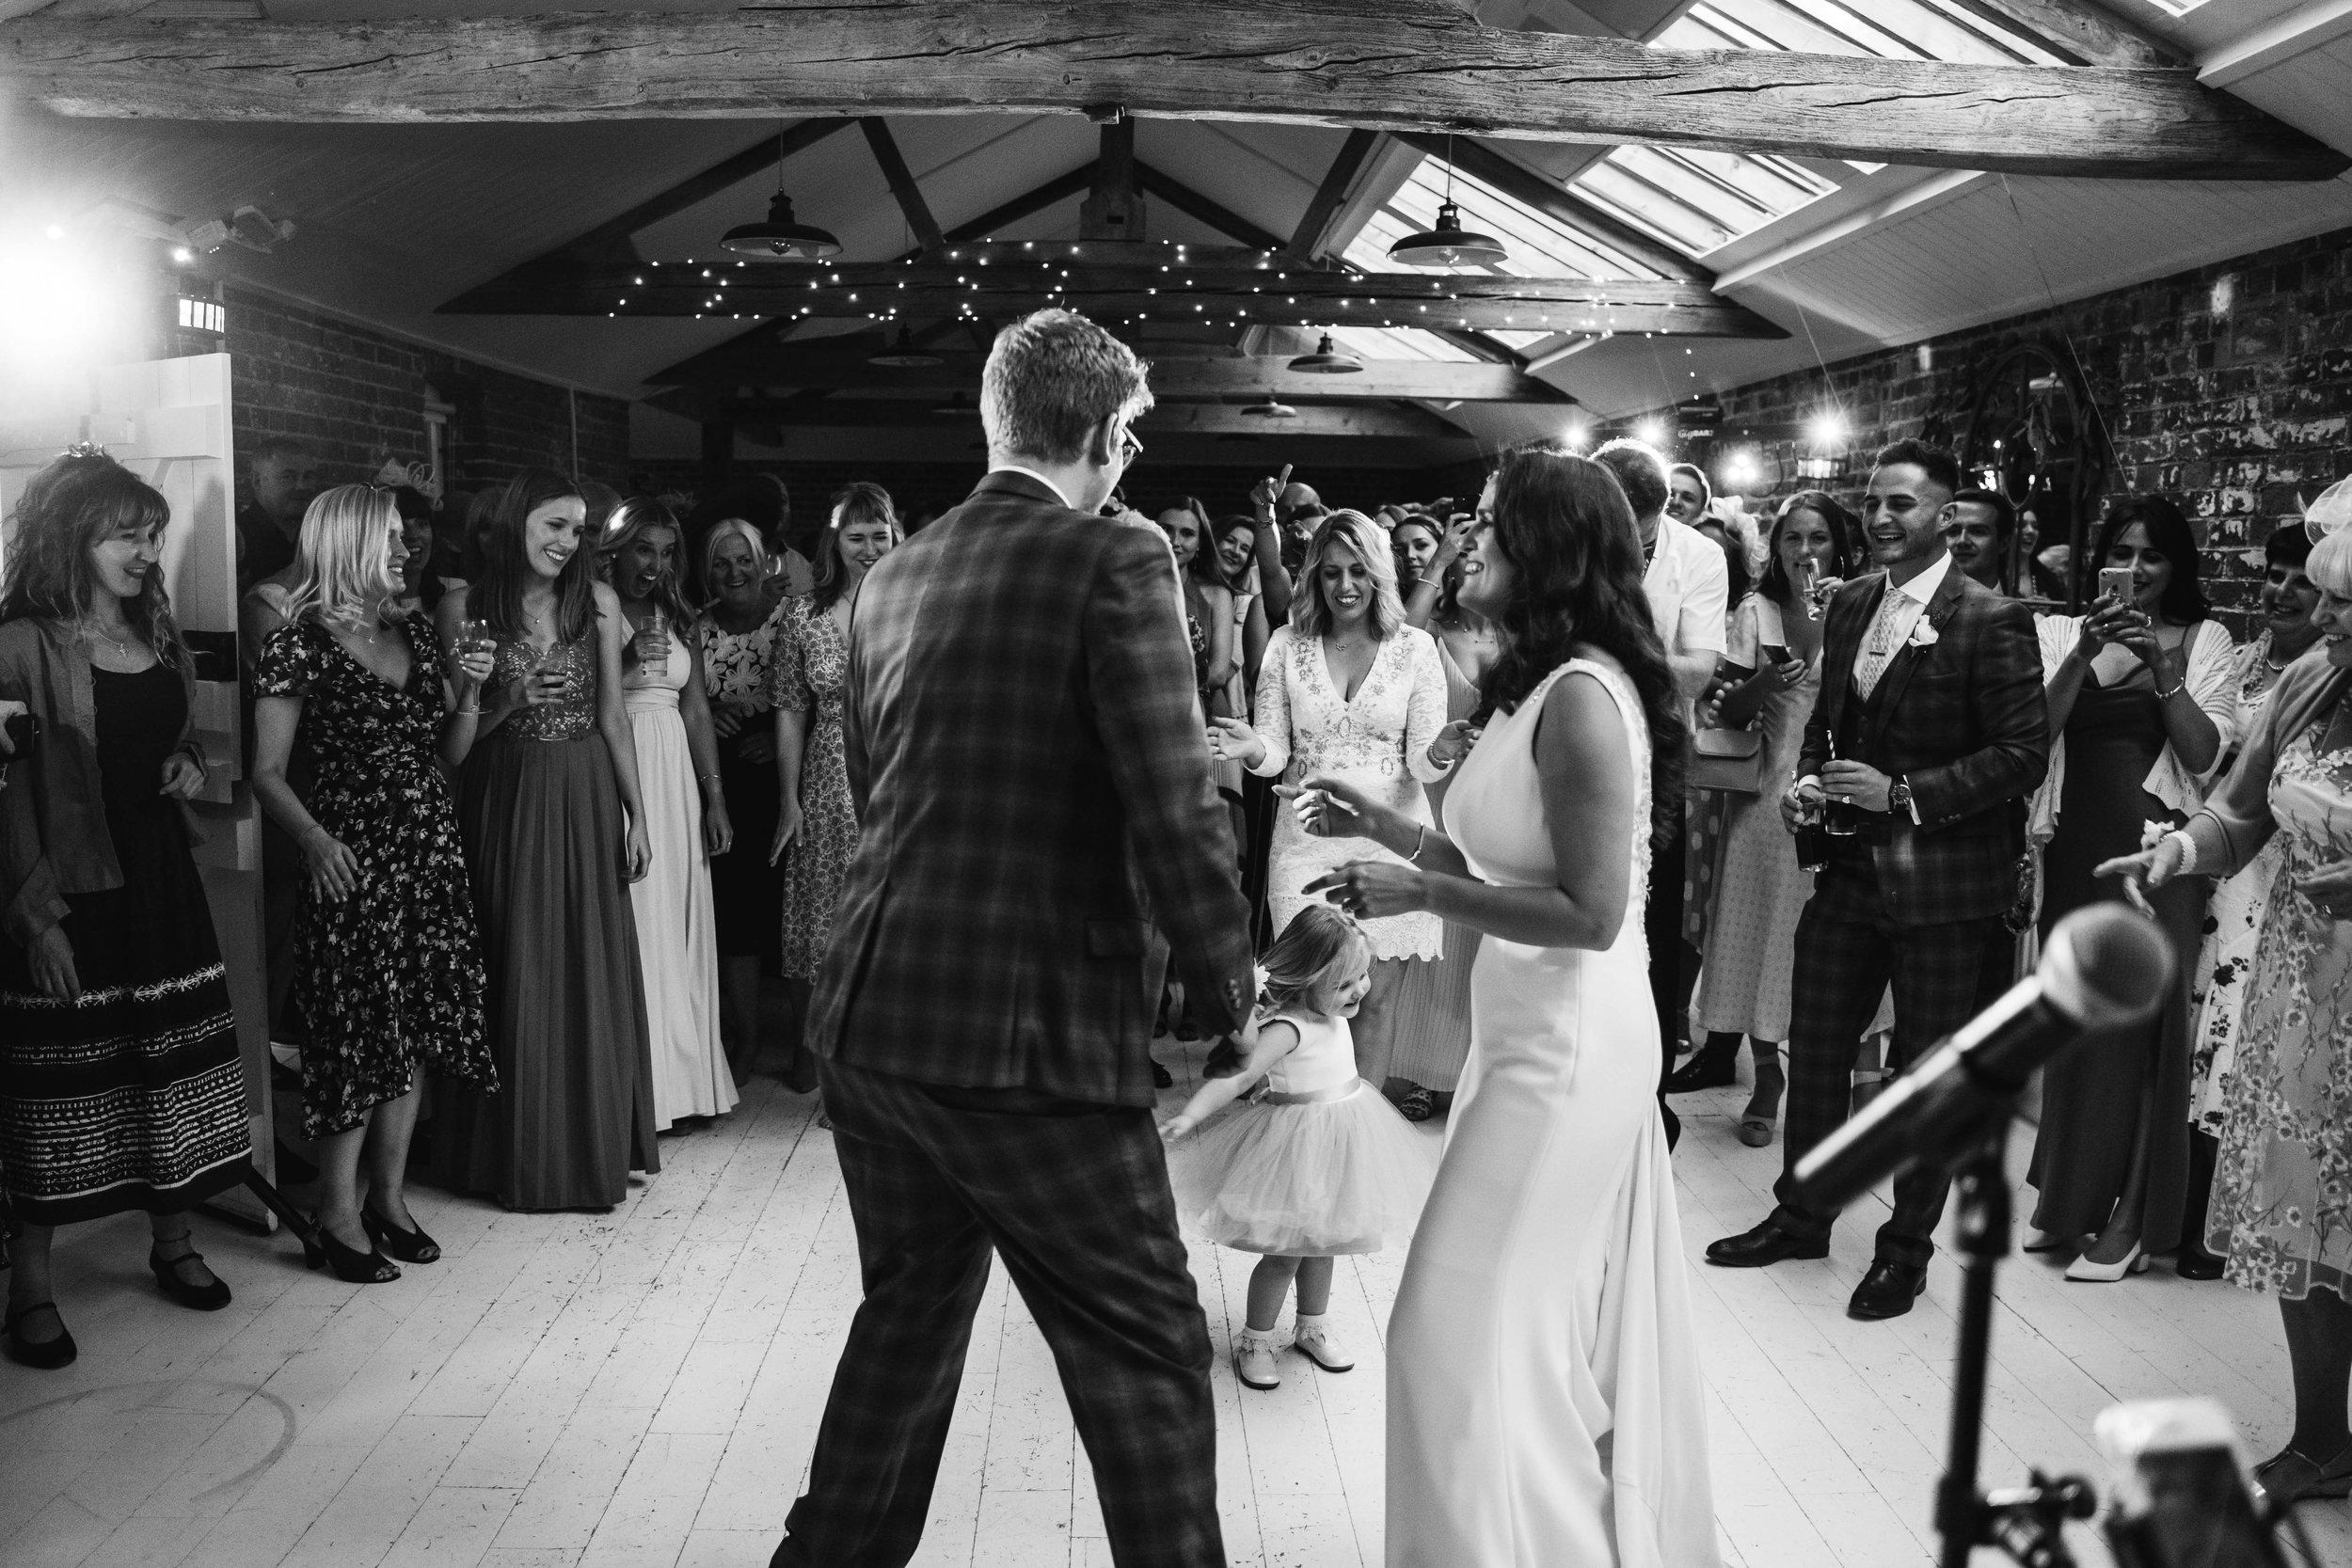 kent-wedding-photographer-108970.jpg